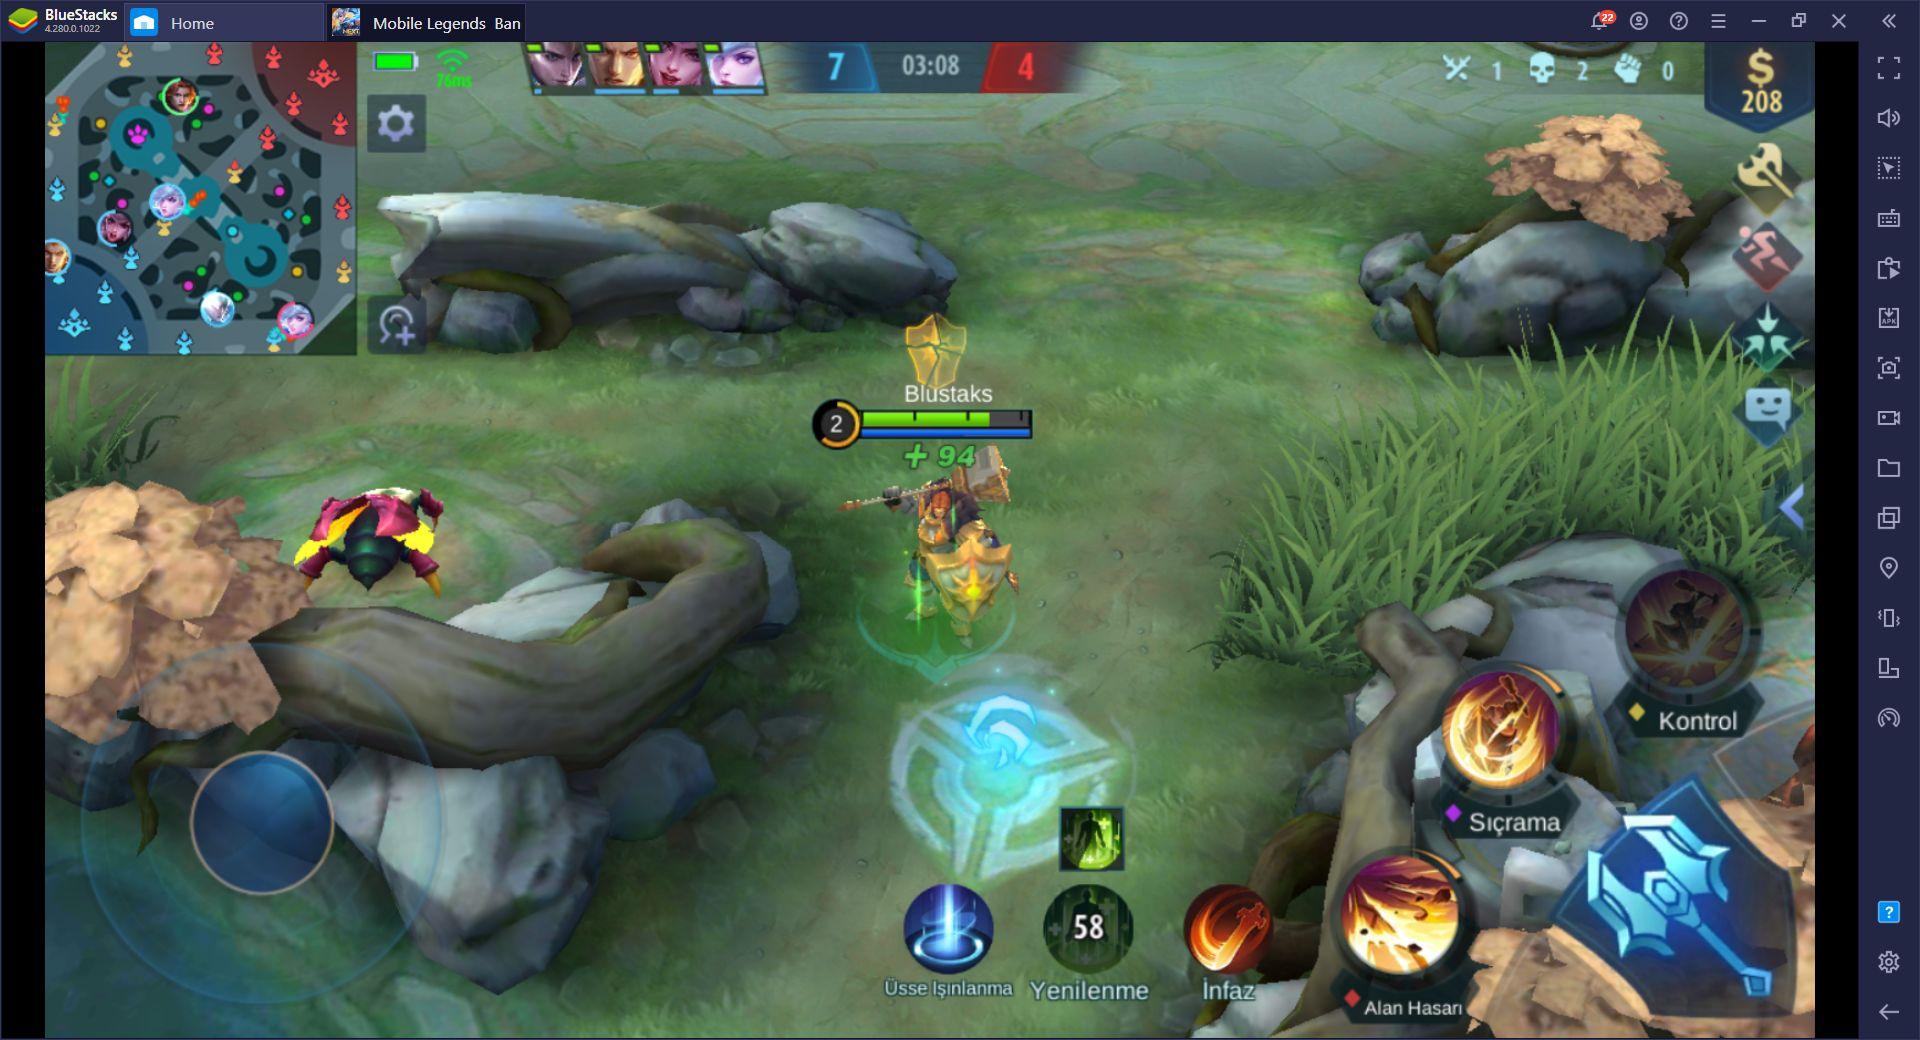 Mobile Legends Bang Bang Ormancı Rehberi